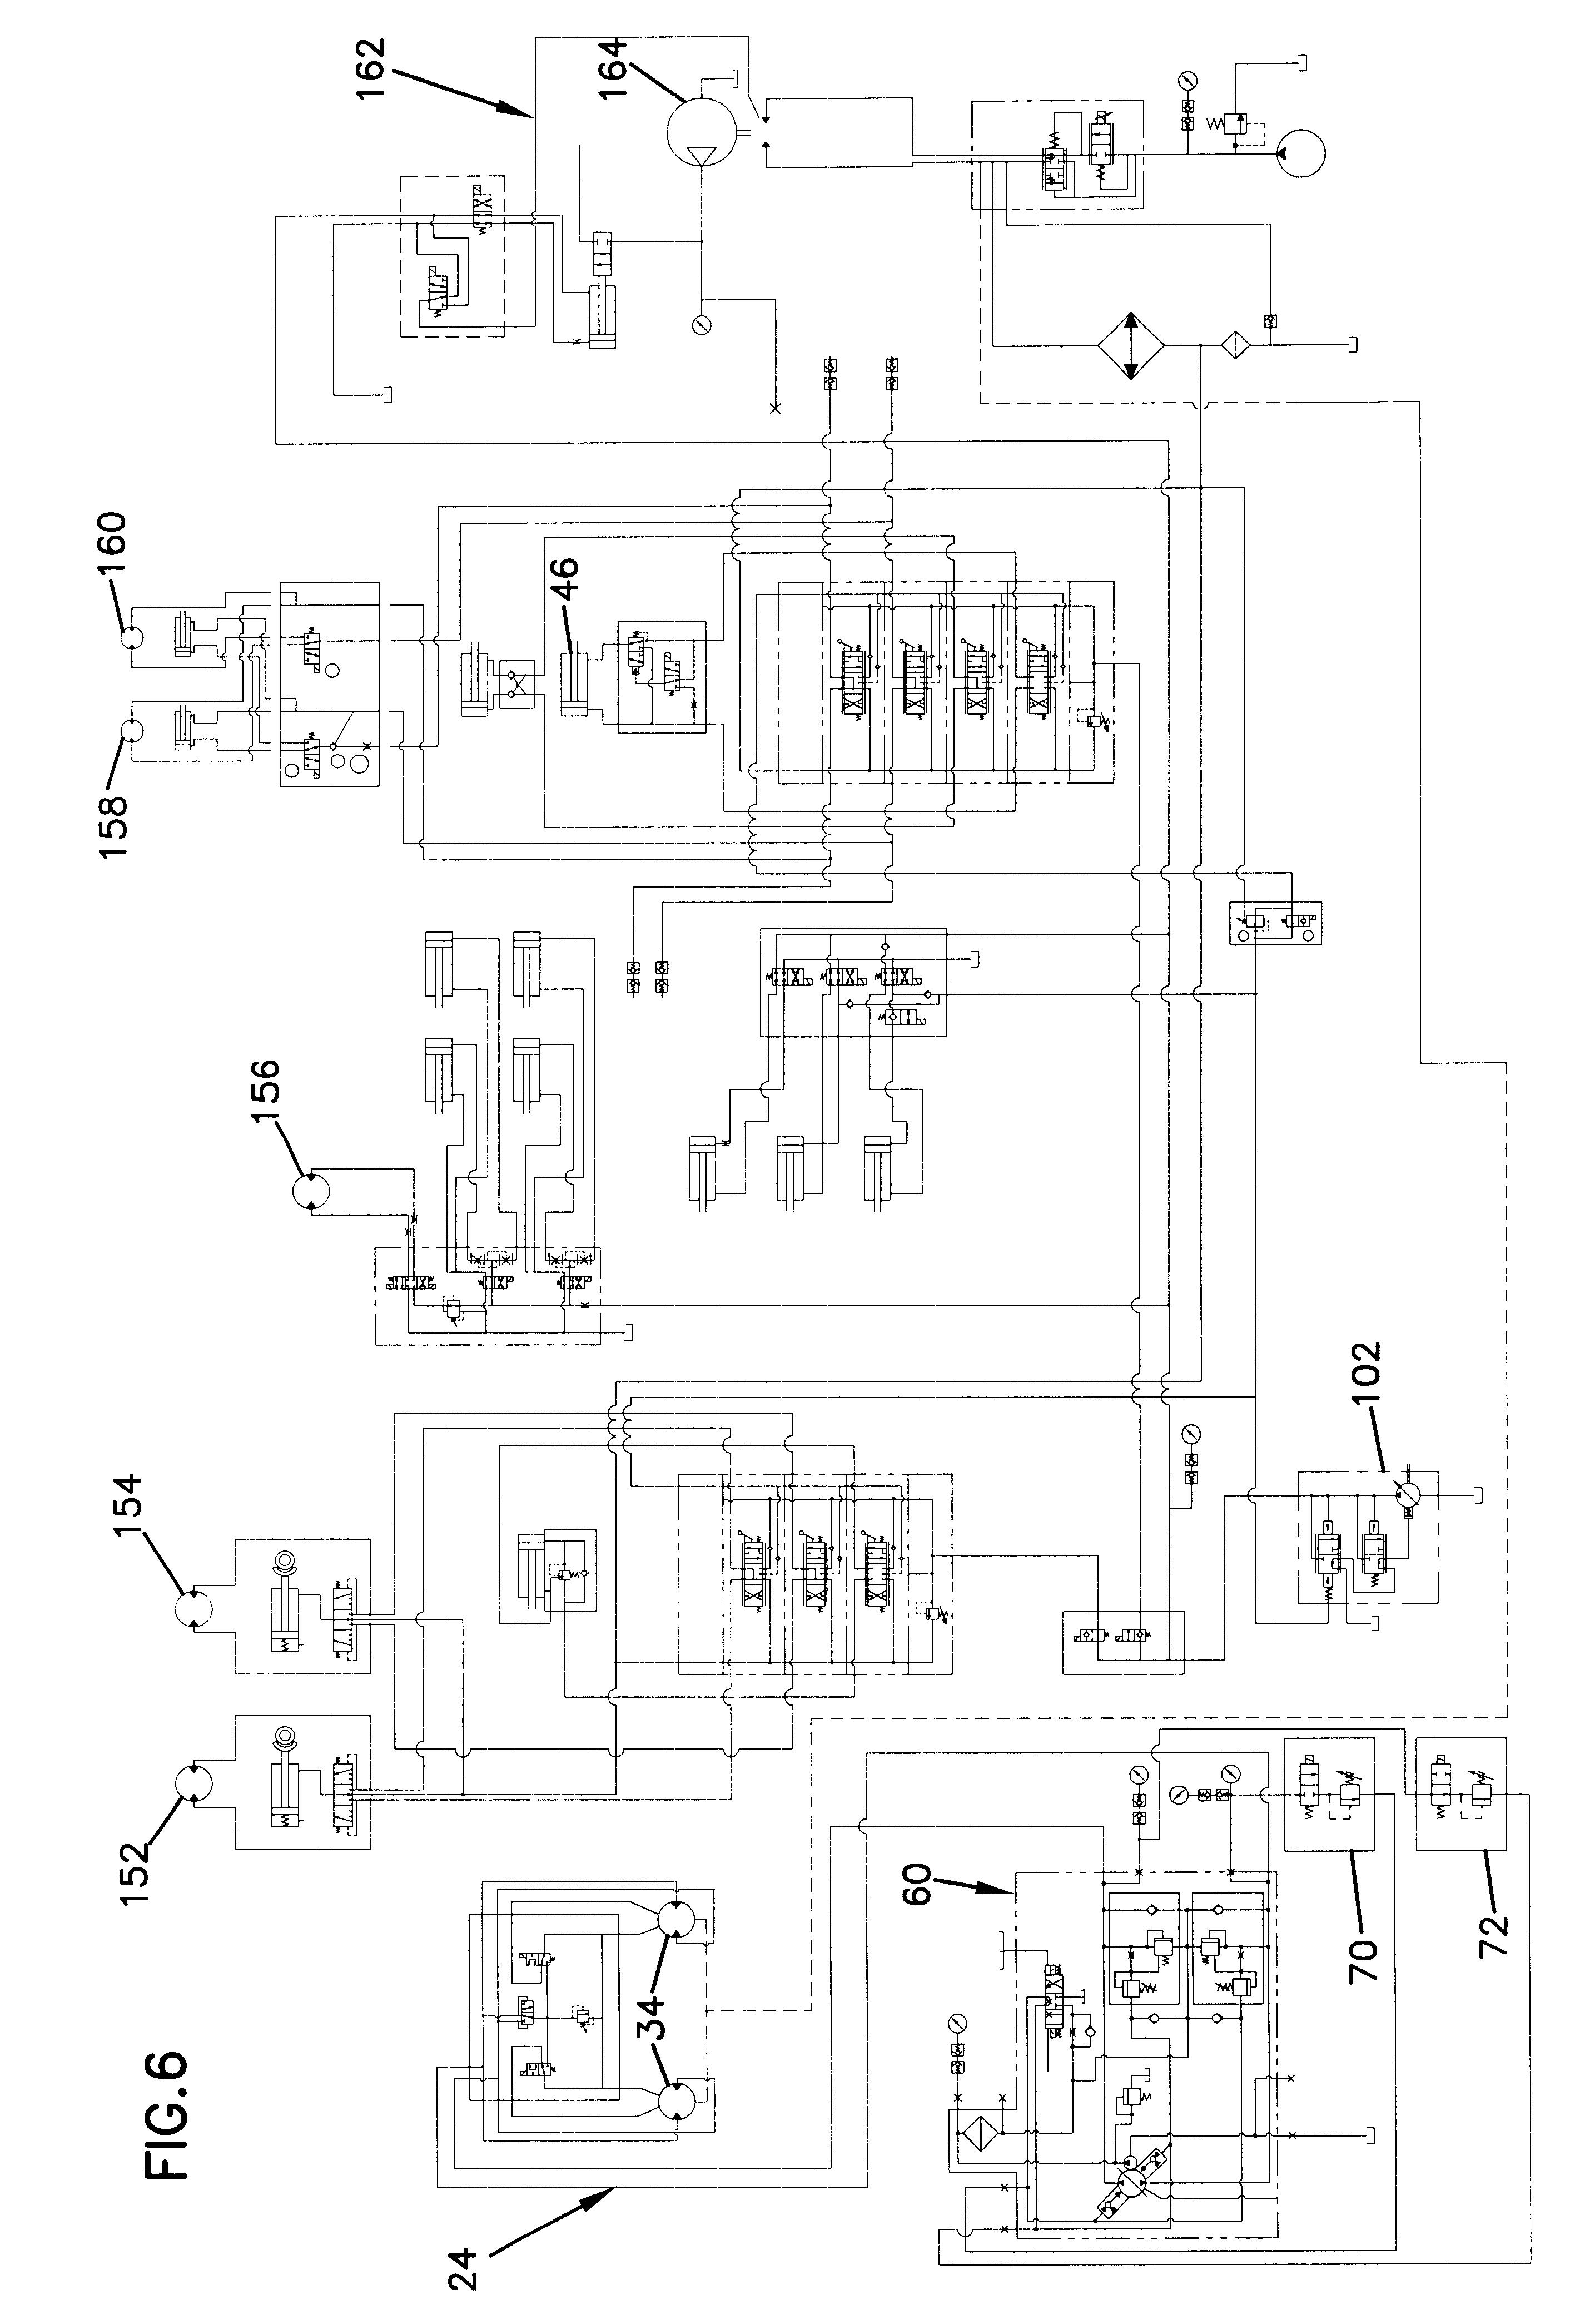 Image Result For Directional Drilling Diagram